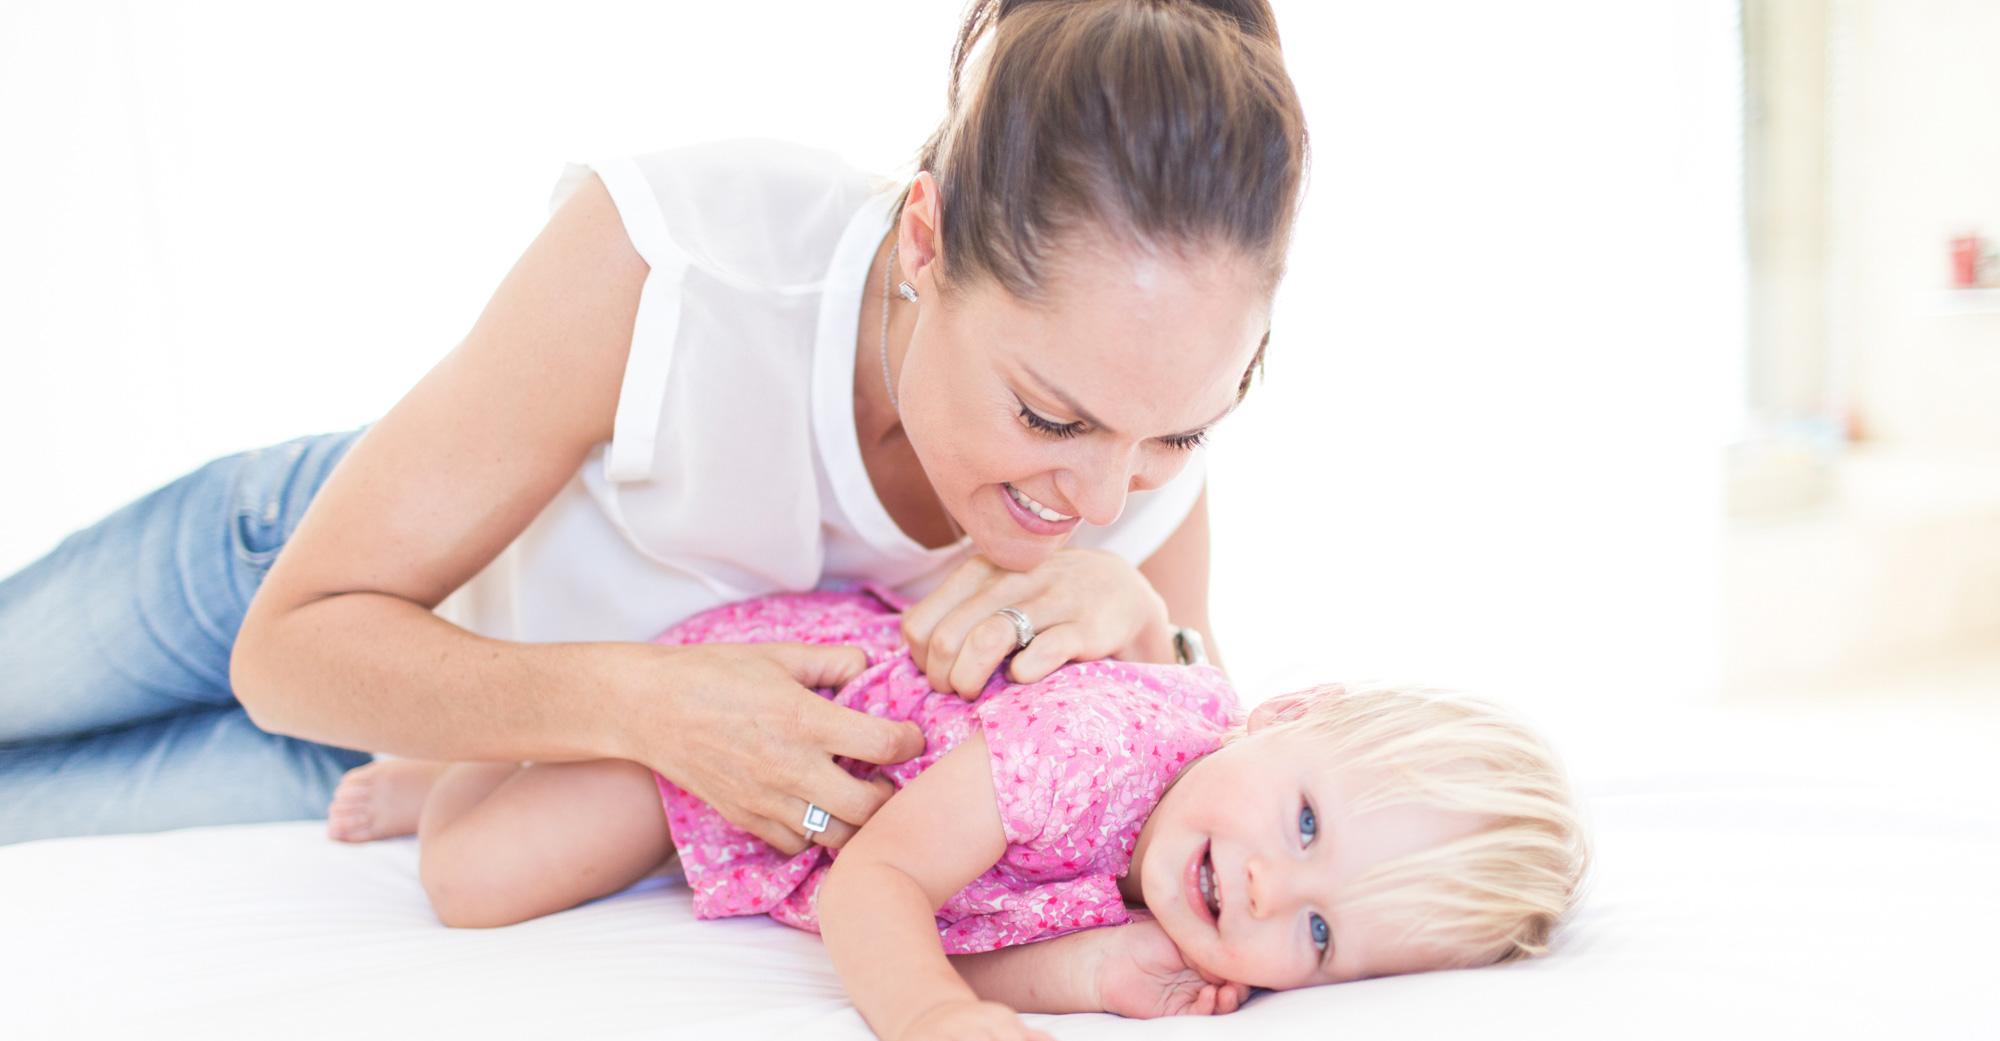 Zoe Bingley-Pullin On Motherhood And Nutrition